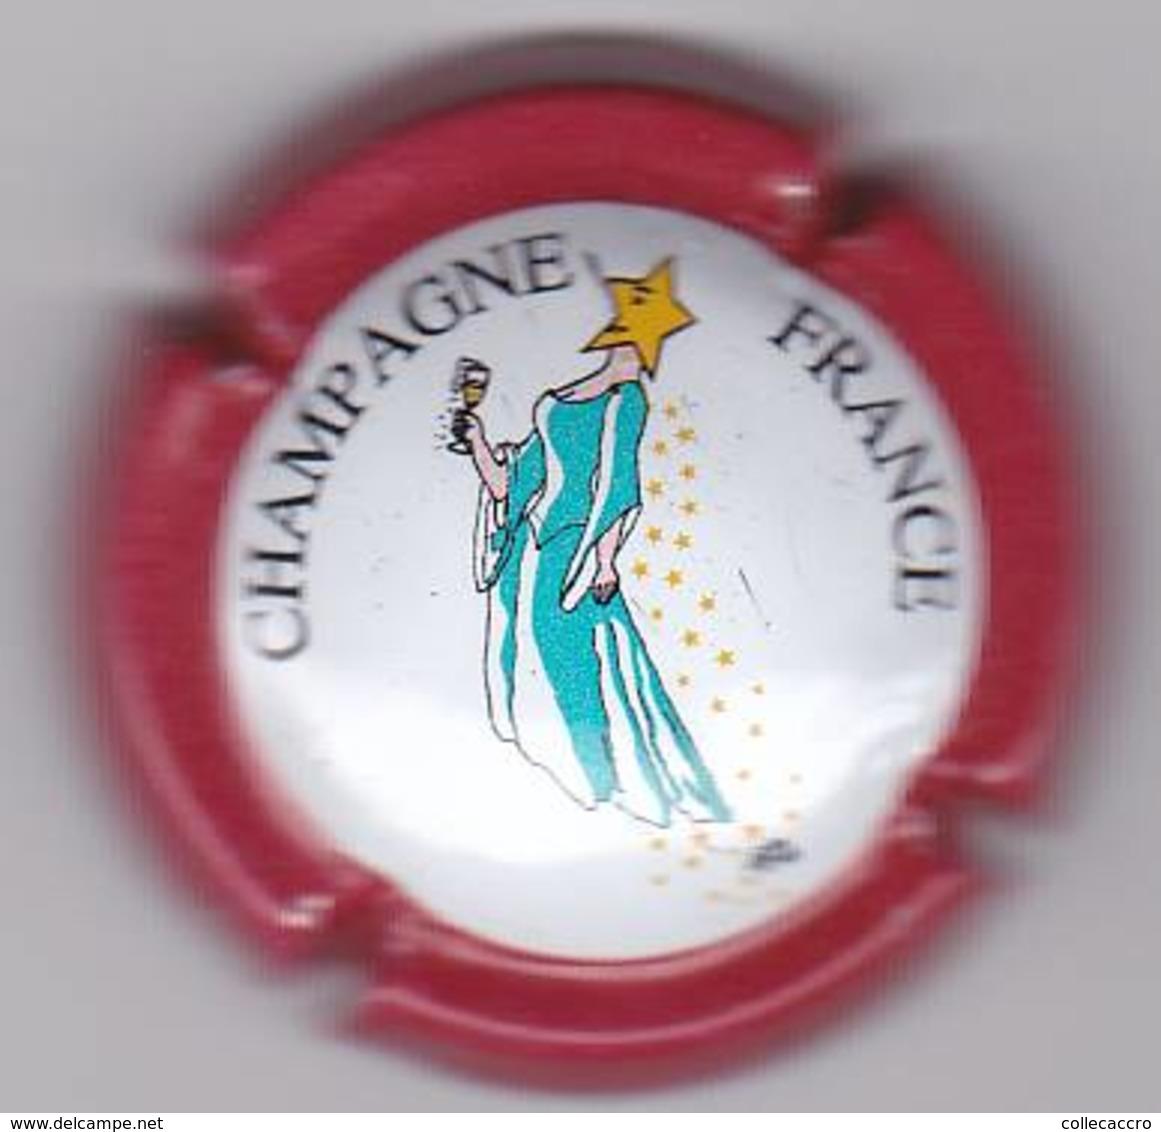 GENERIQUE N°655b ROUGE CLAIR - Champagne